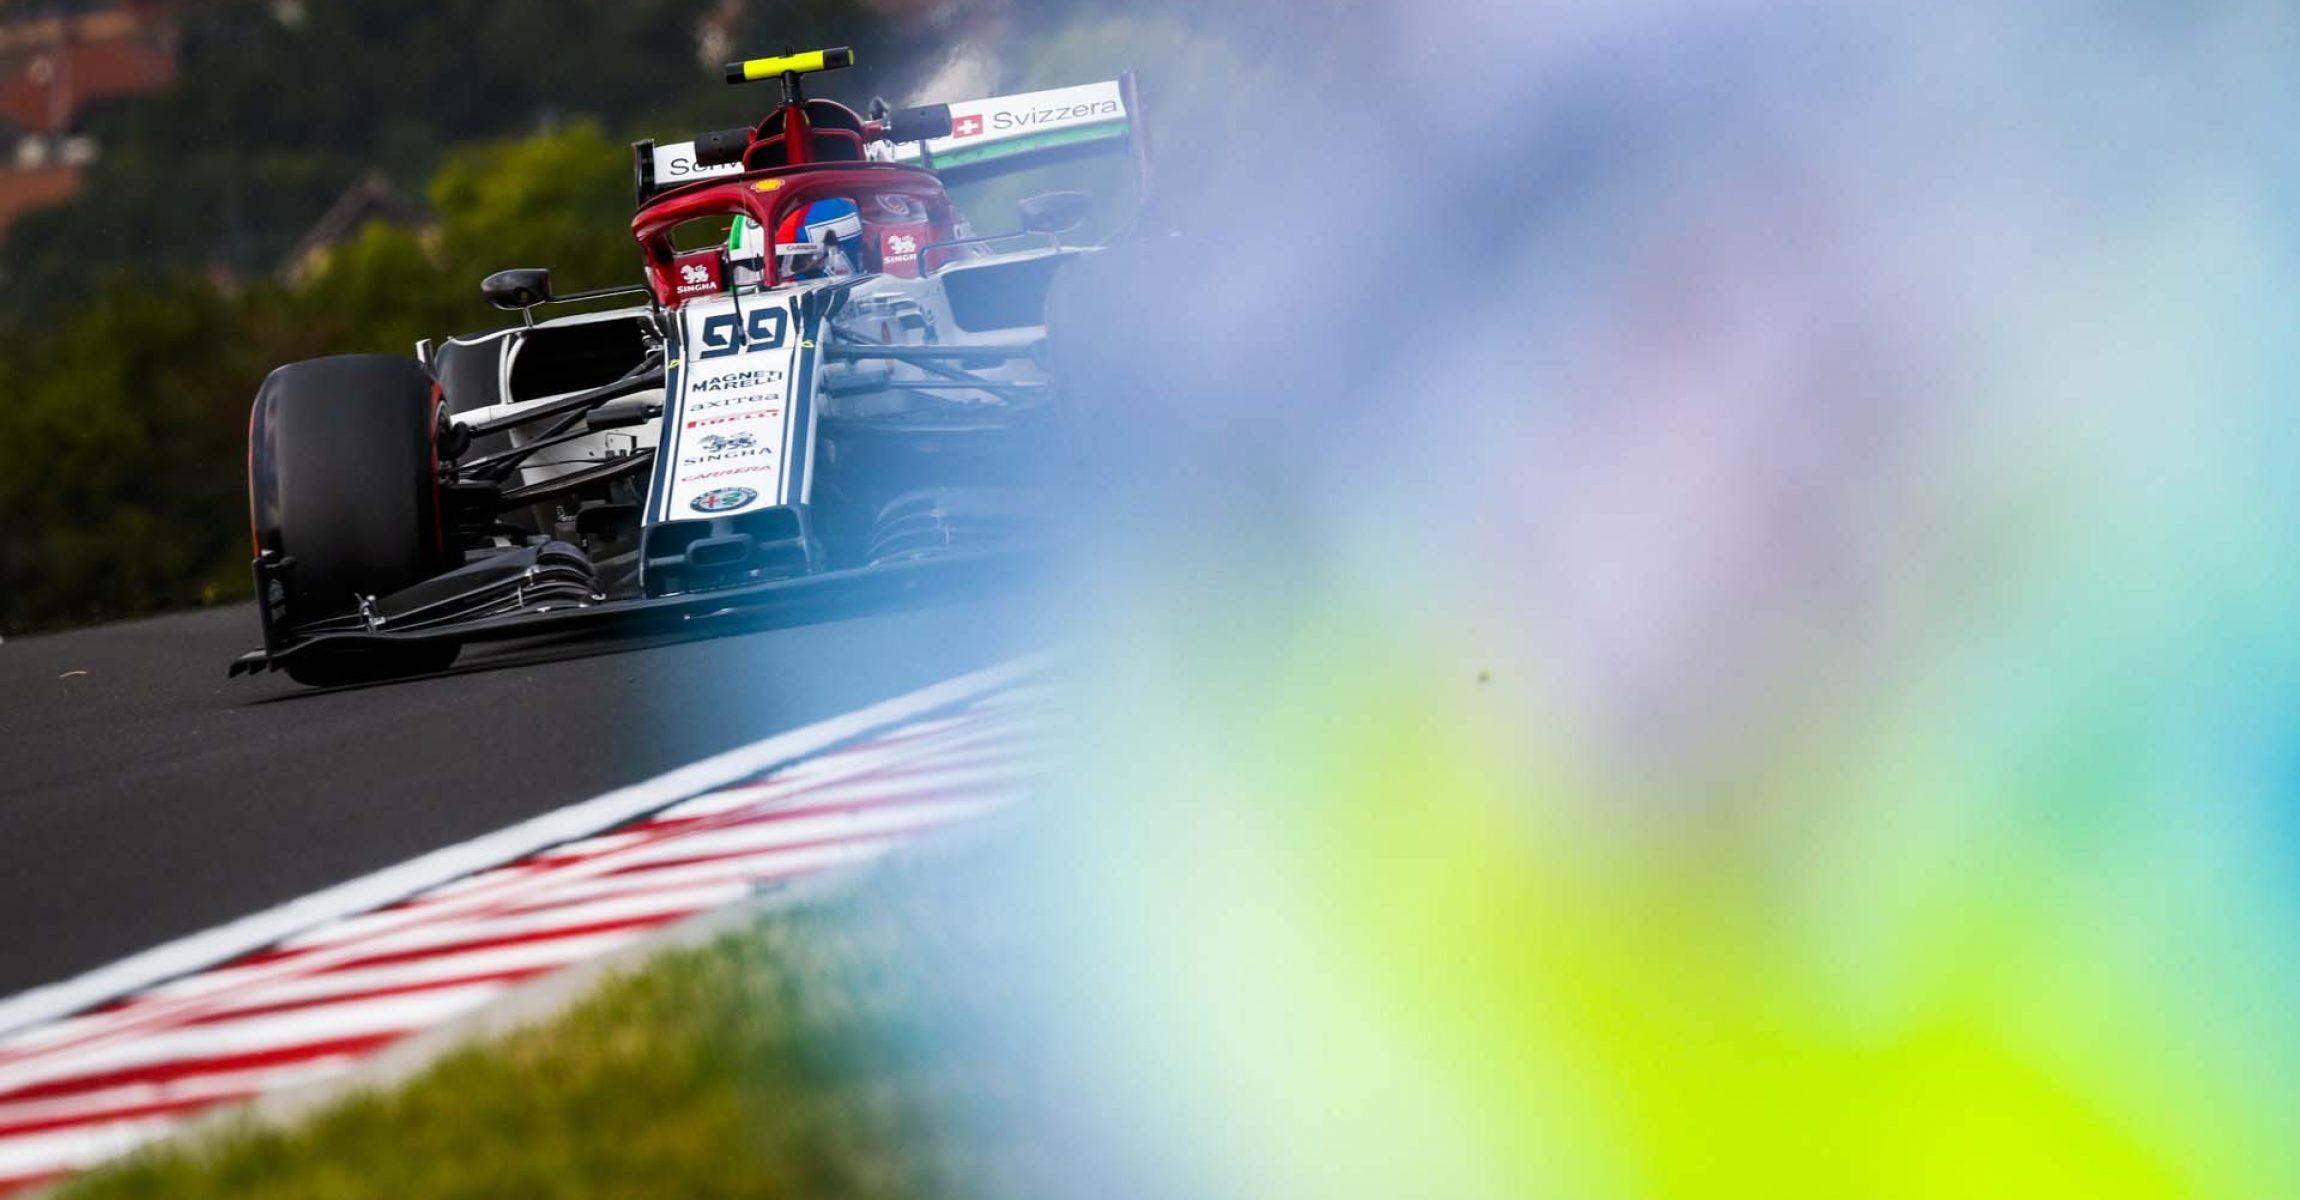 GIOVINAZZI Antonio (ita), Alfa Romeo Racing C38, action during the 2019 Formula One World Championship, Grand Prix of Hungary from august 1 to 4, Hungaroring, Budapest - Photo Florent Gooden / DPPI